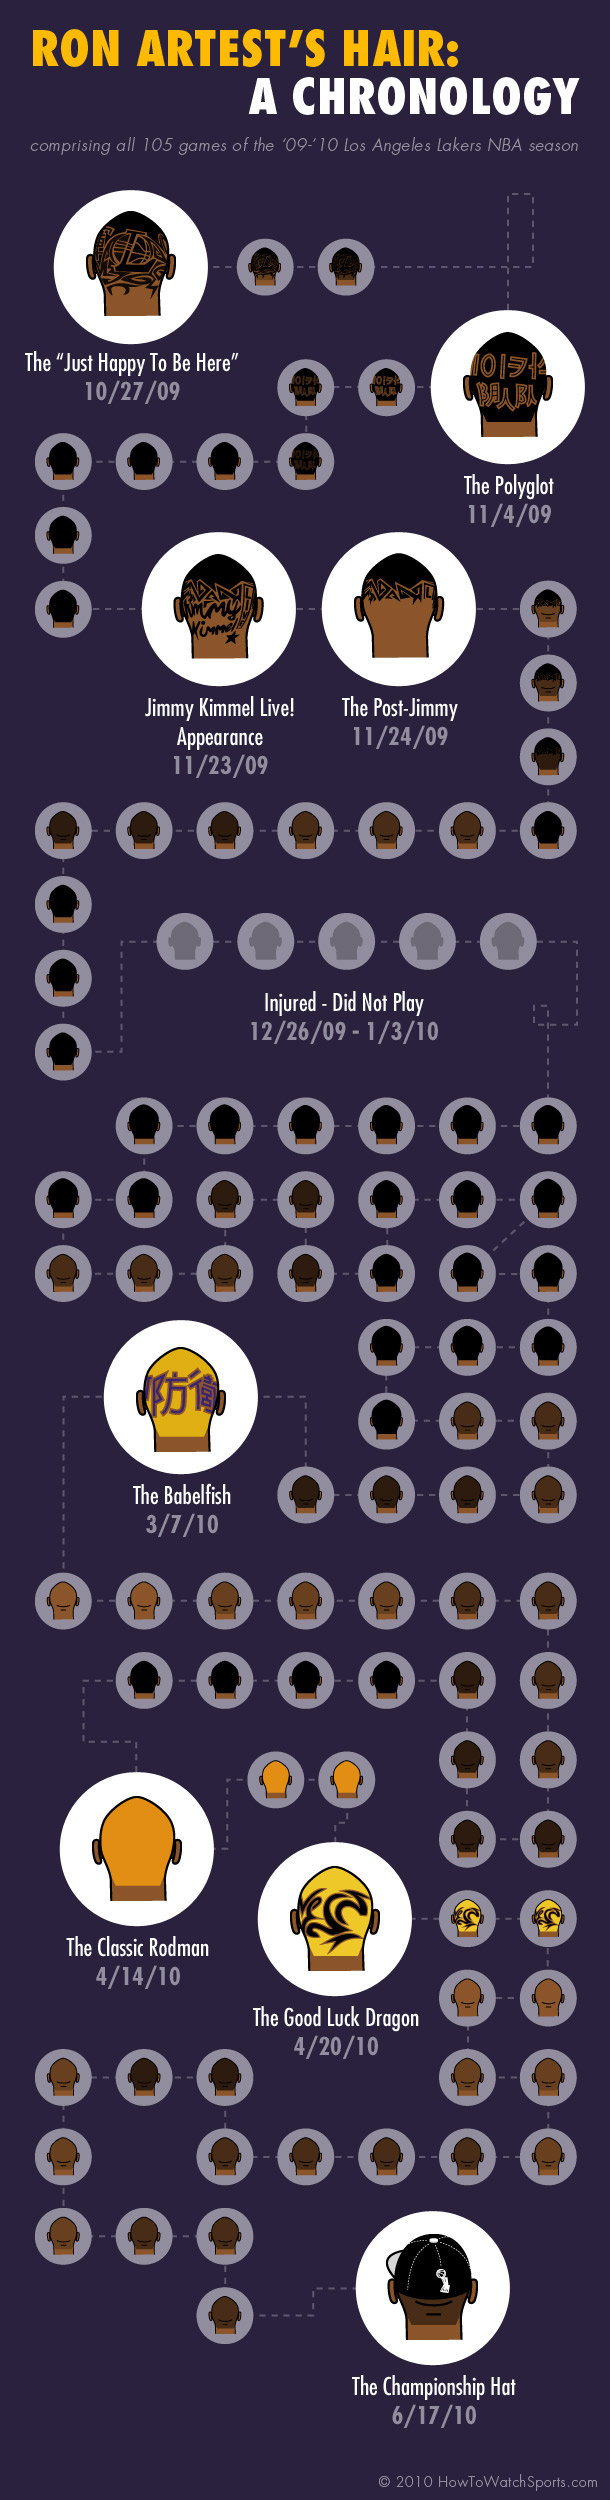 http://sportige.com/wp-content/uploads/2011/12/Ron-Artest-Infographic.jpg